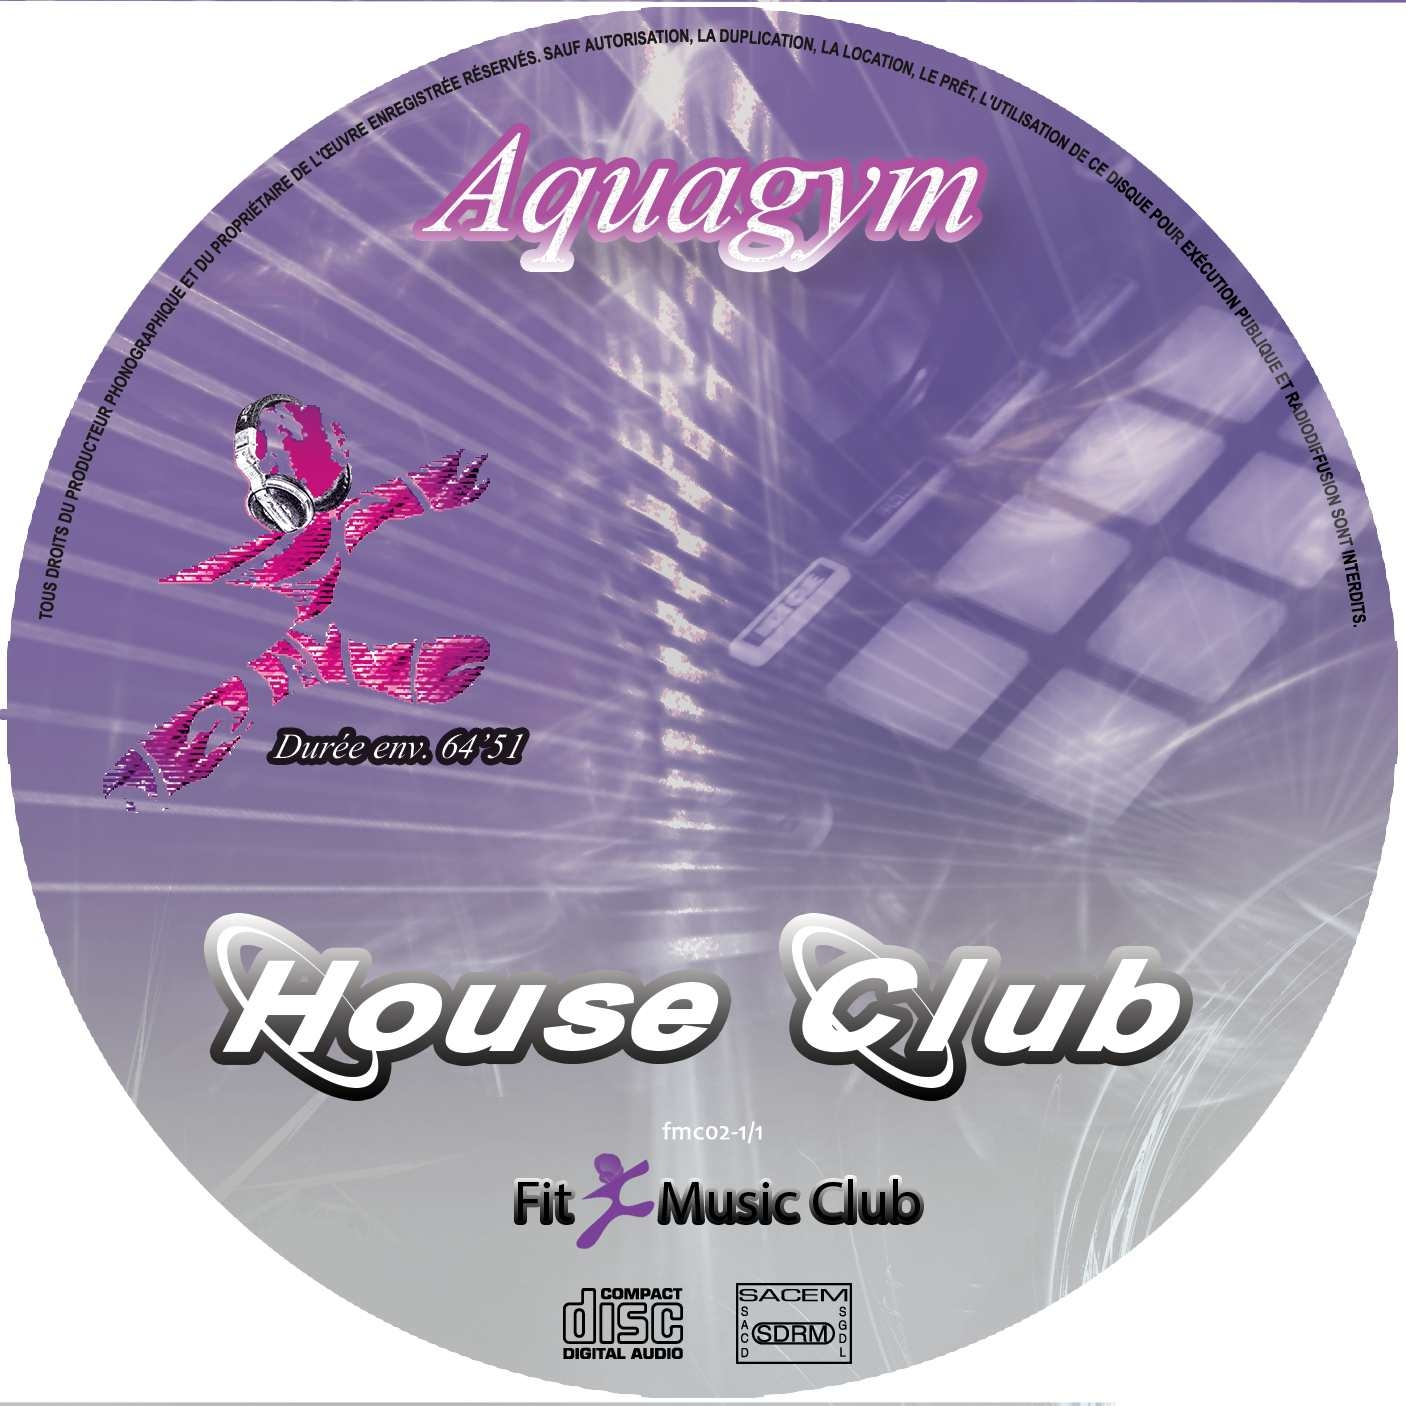 House Club / Aquagym